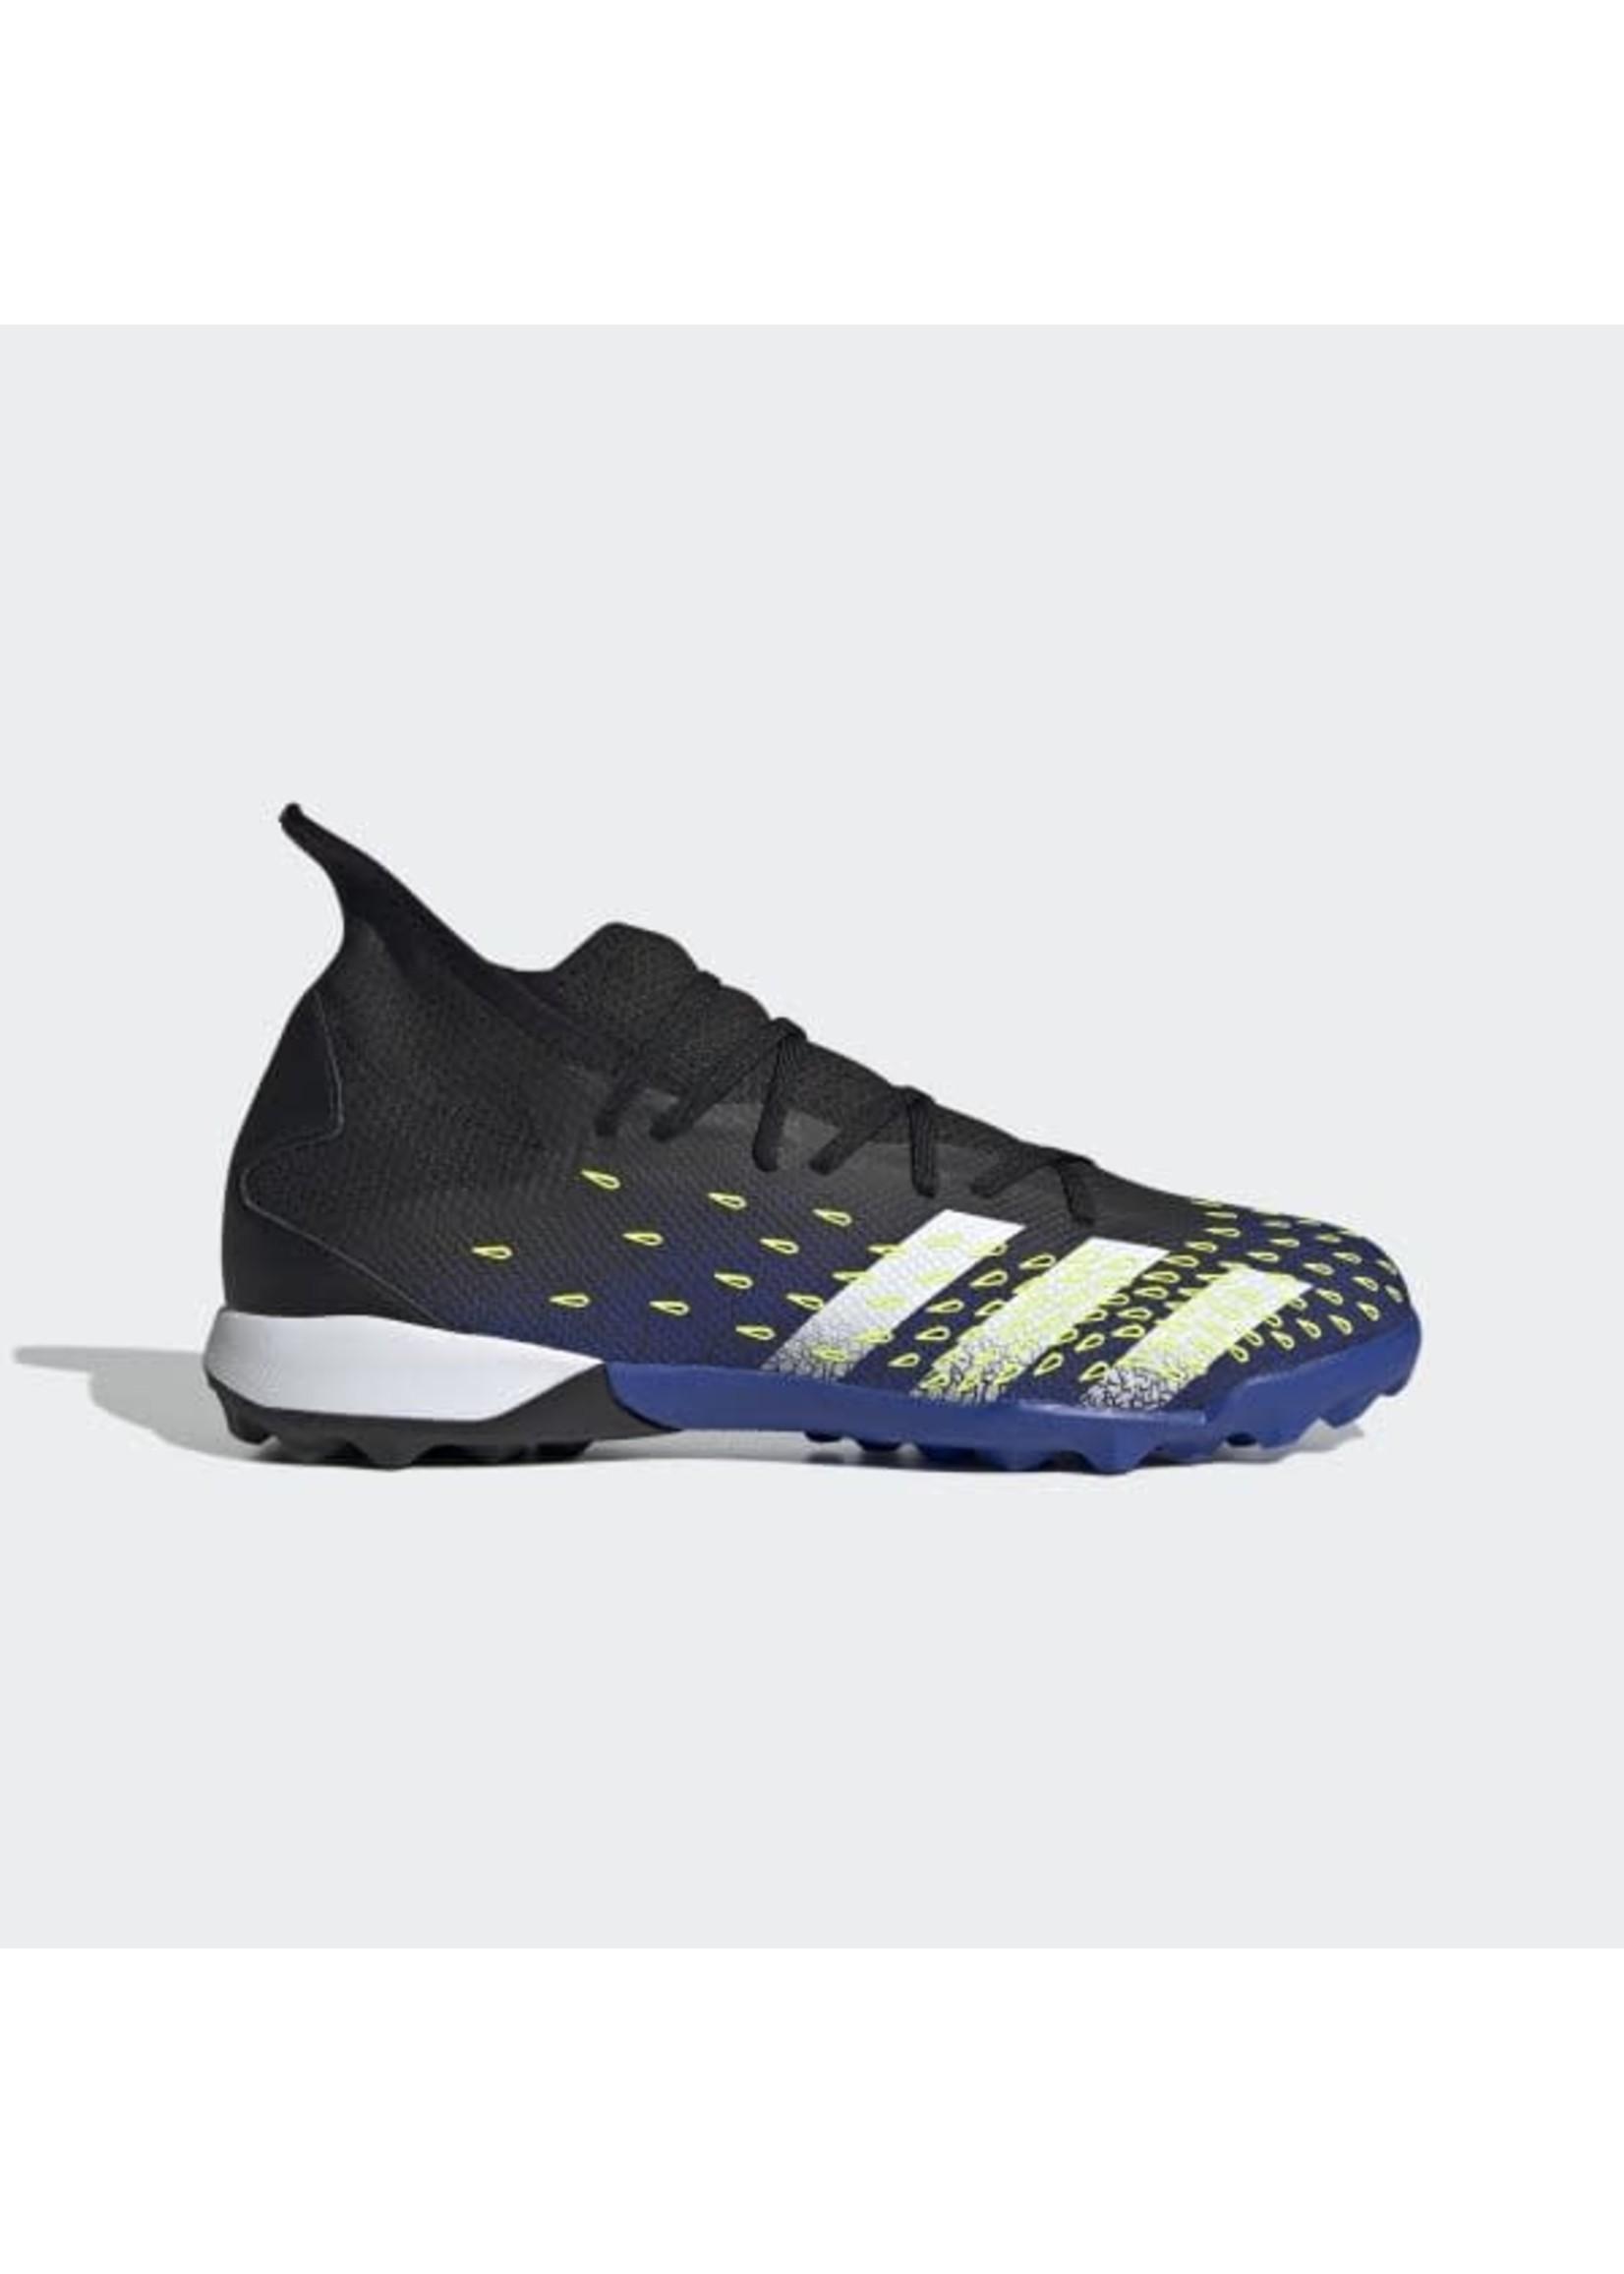 Adidas Predator Freak.3 TF - Blue/Yellow